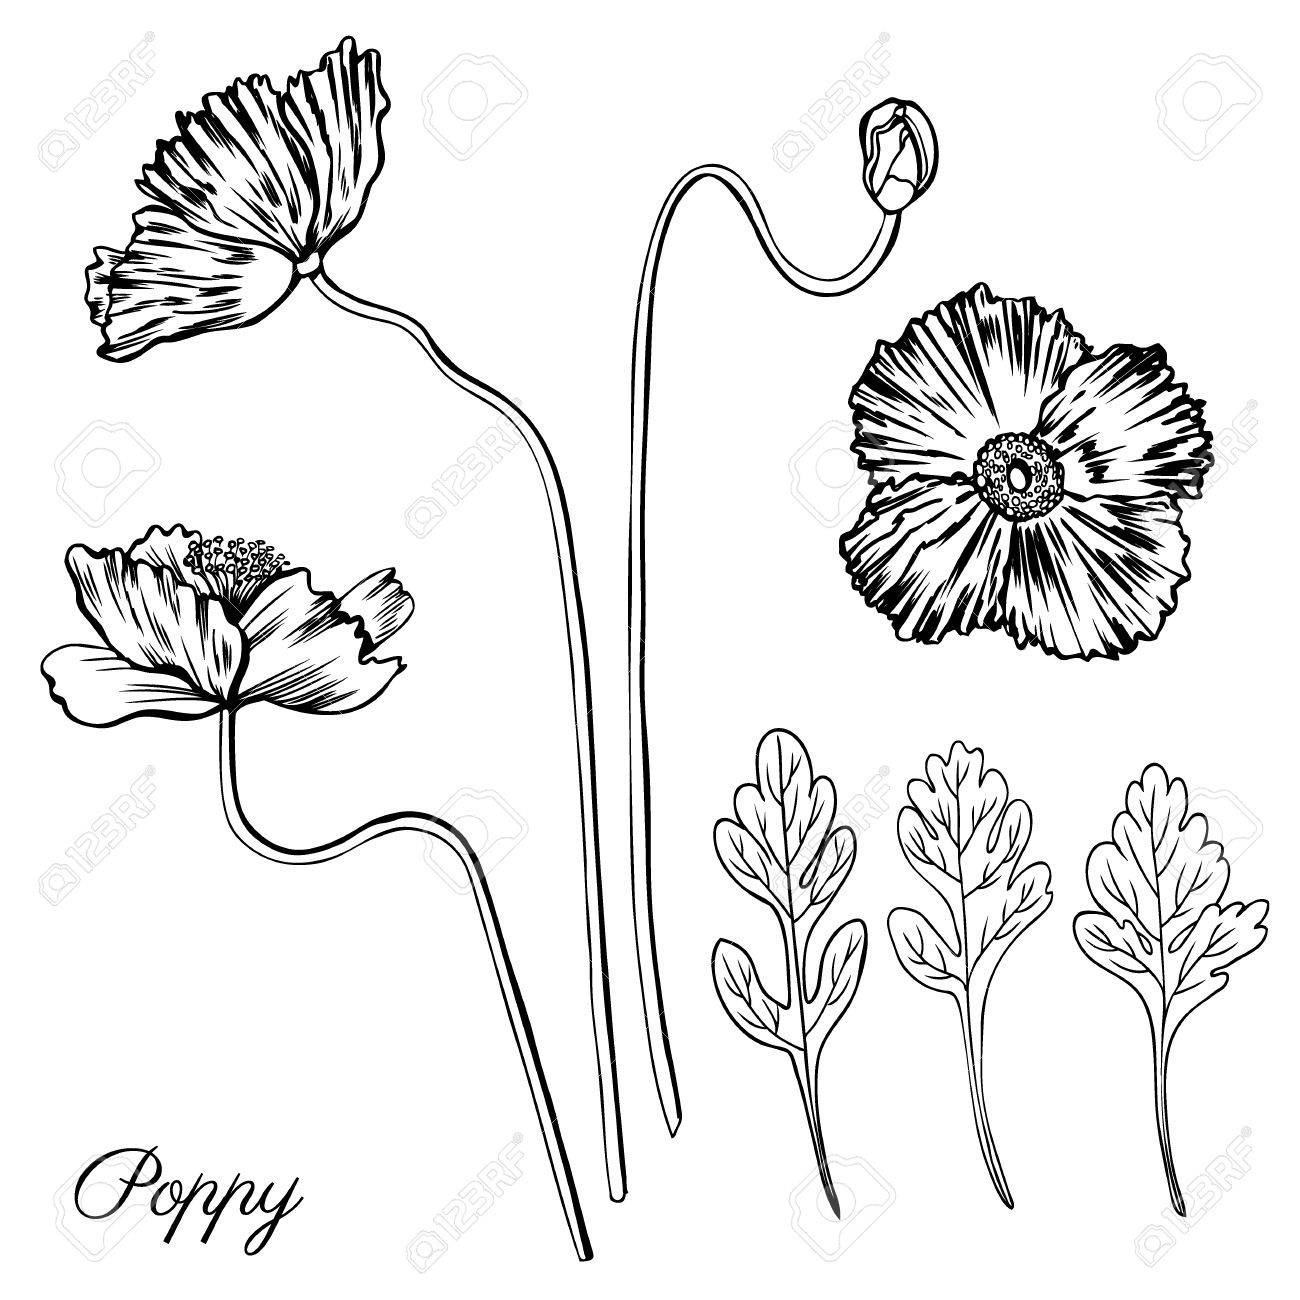 1300x1300 Poppy Flower, Bud, Leaves Vector Engraving Sketch Hand Drawn